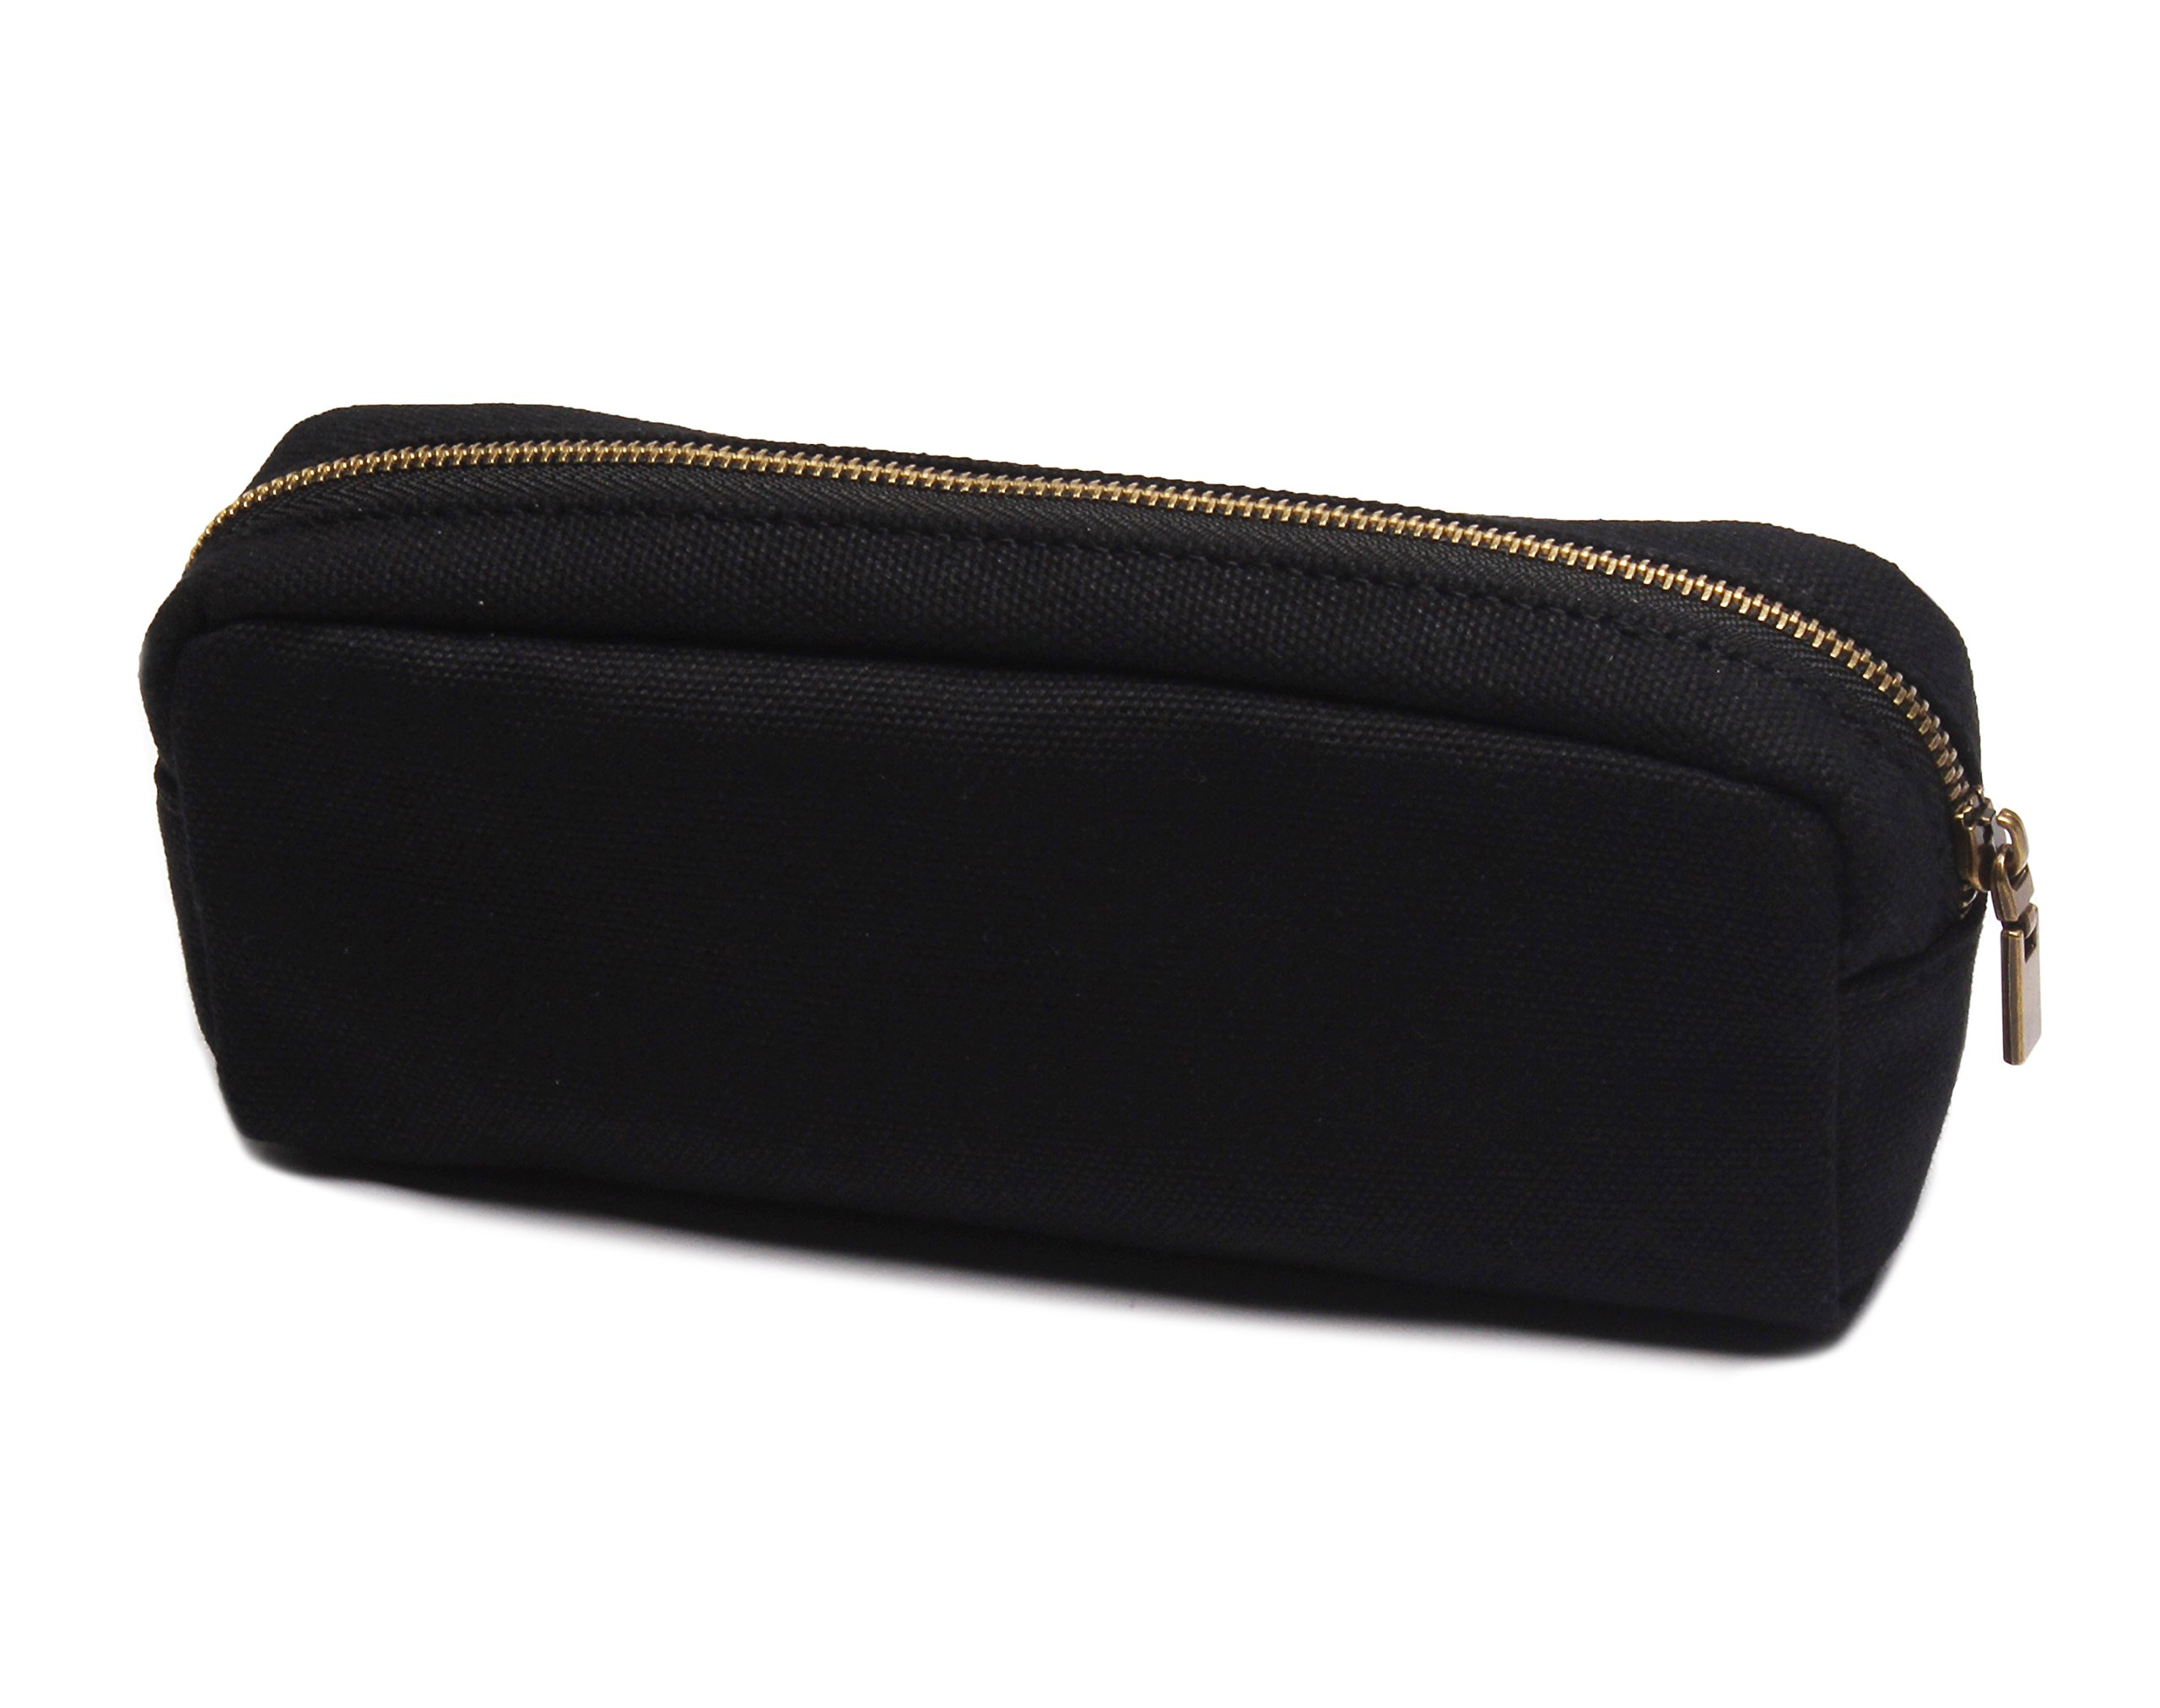 Karitco Plain Canvas Pencil Case with Brass Zipper 7.3 x 3 Inch (Classic Black)